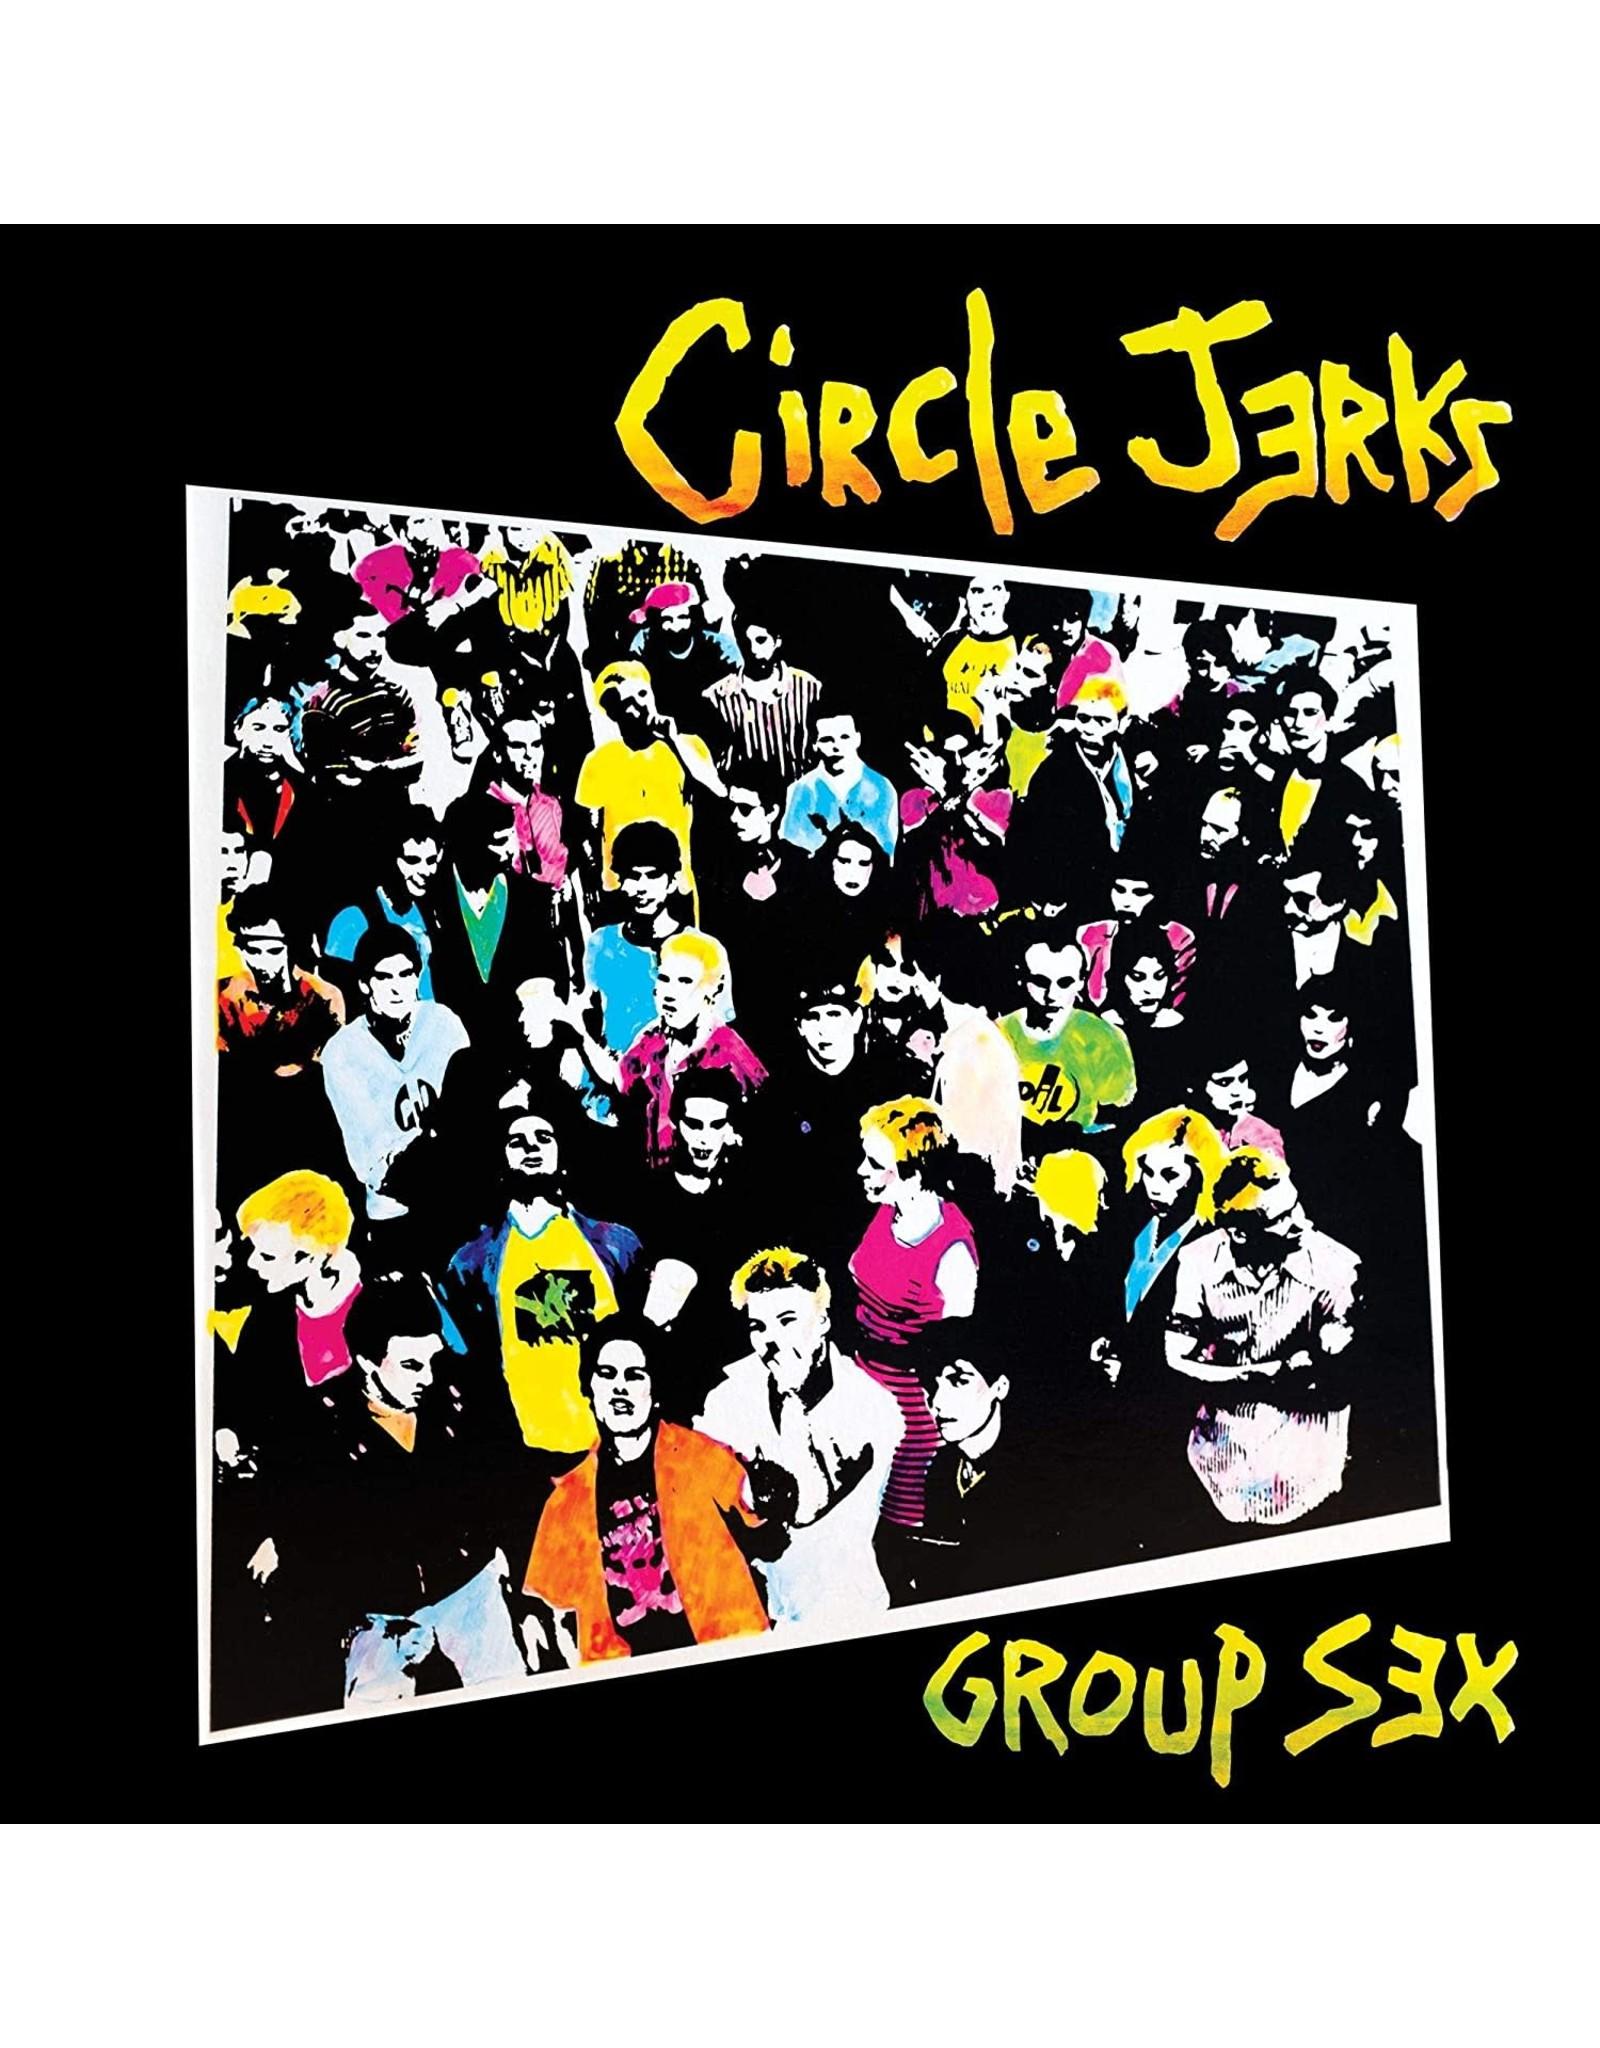 Circle Jerks - Group Sex (40th Anniversary)